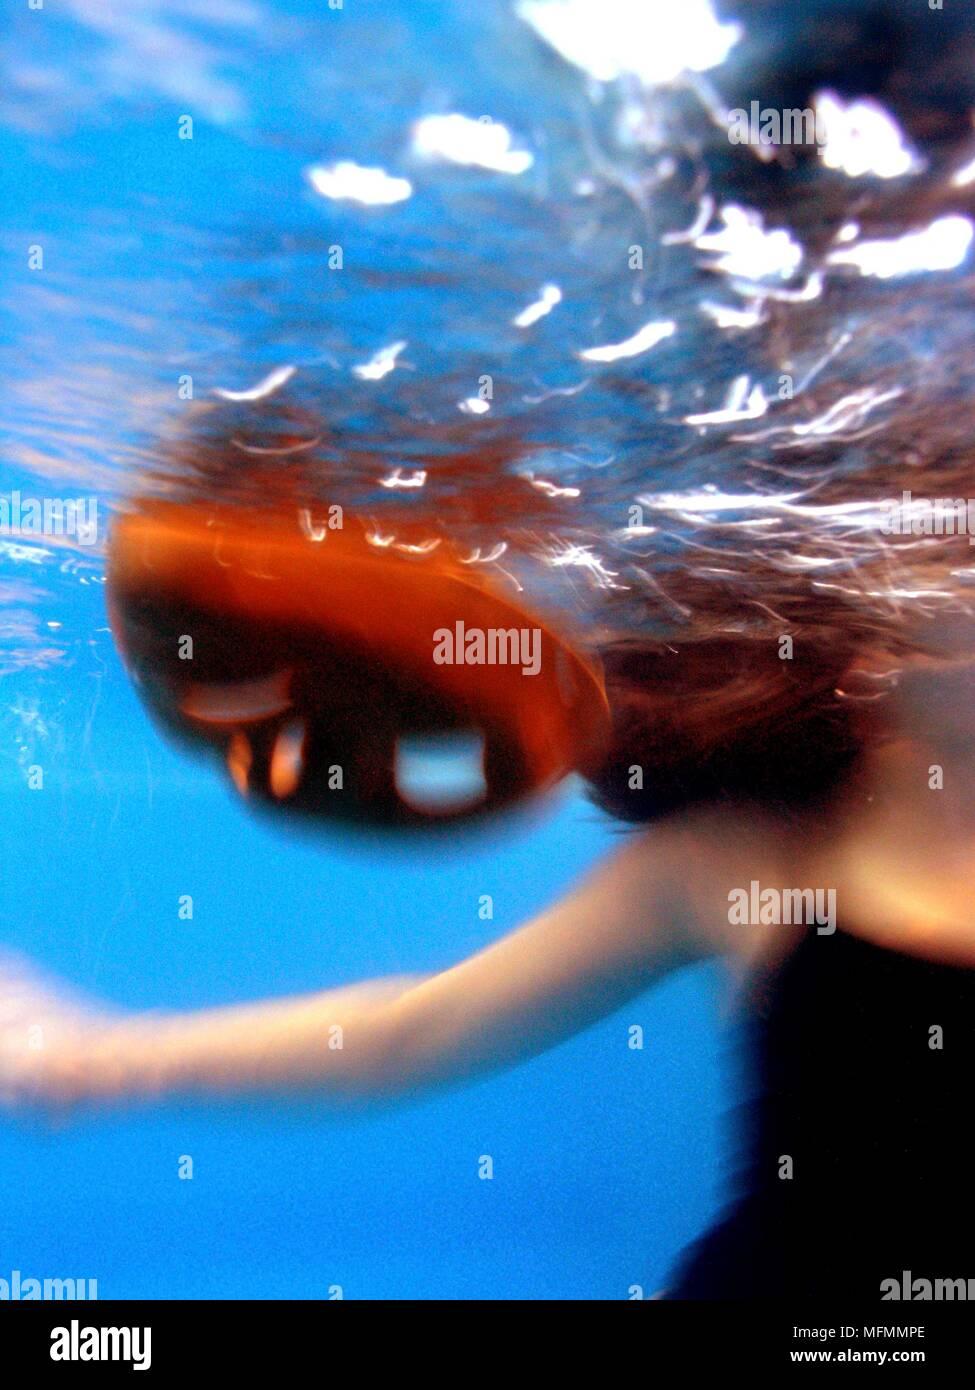 Woman swimming underwater   Ref: CRB416 10009 064  Compulsory Credit: Kate Morwenna Healey/Photoshot Stock Photo